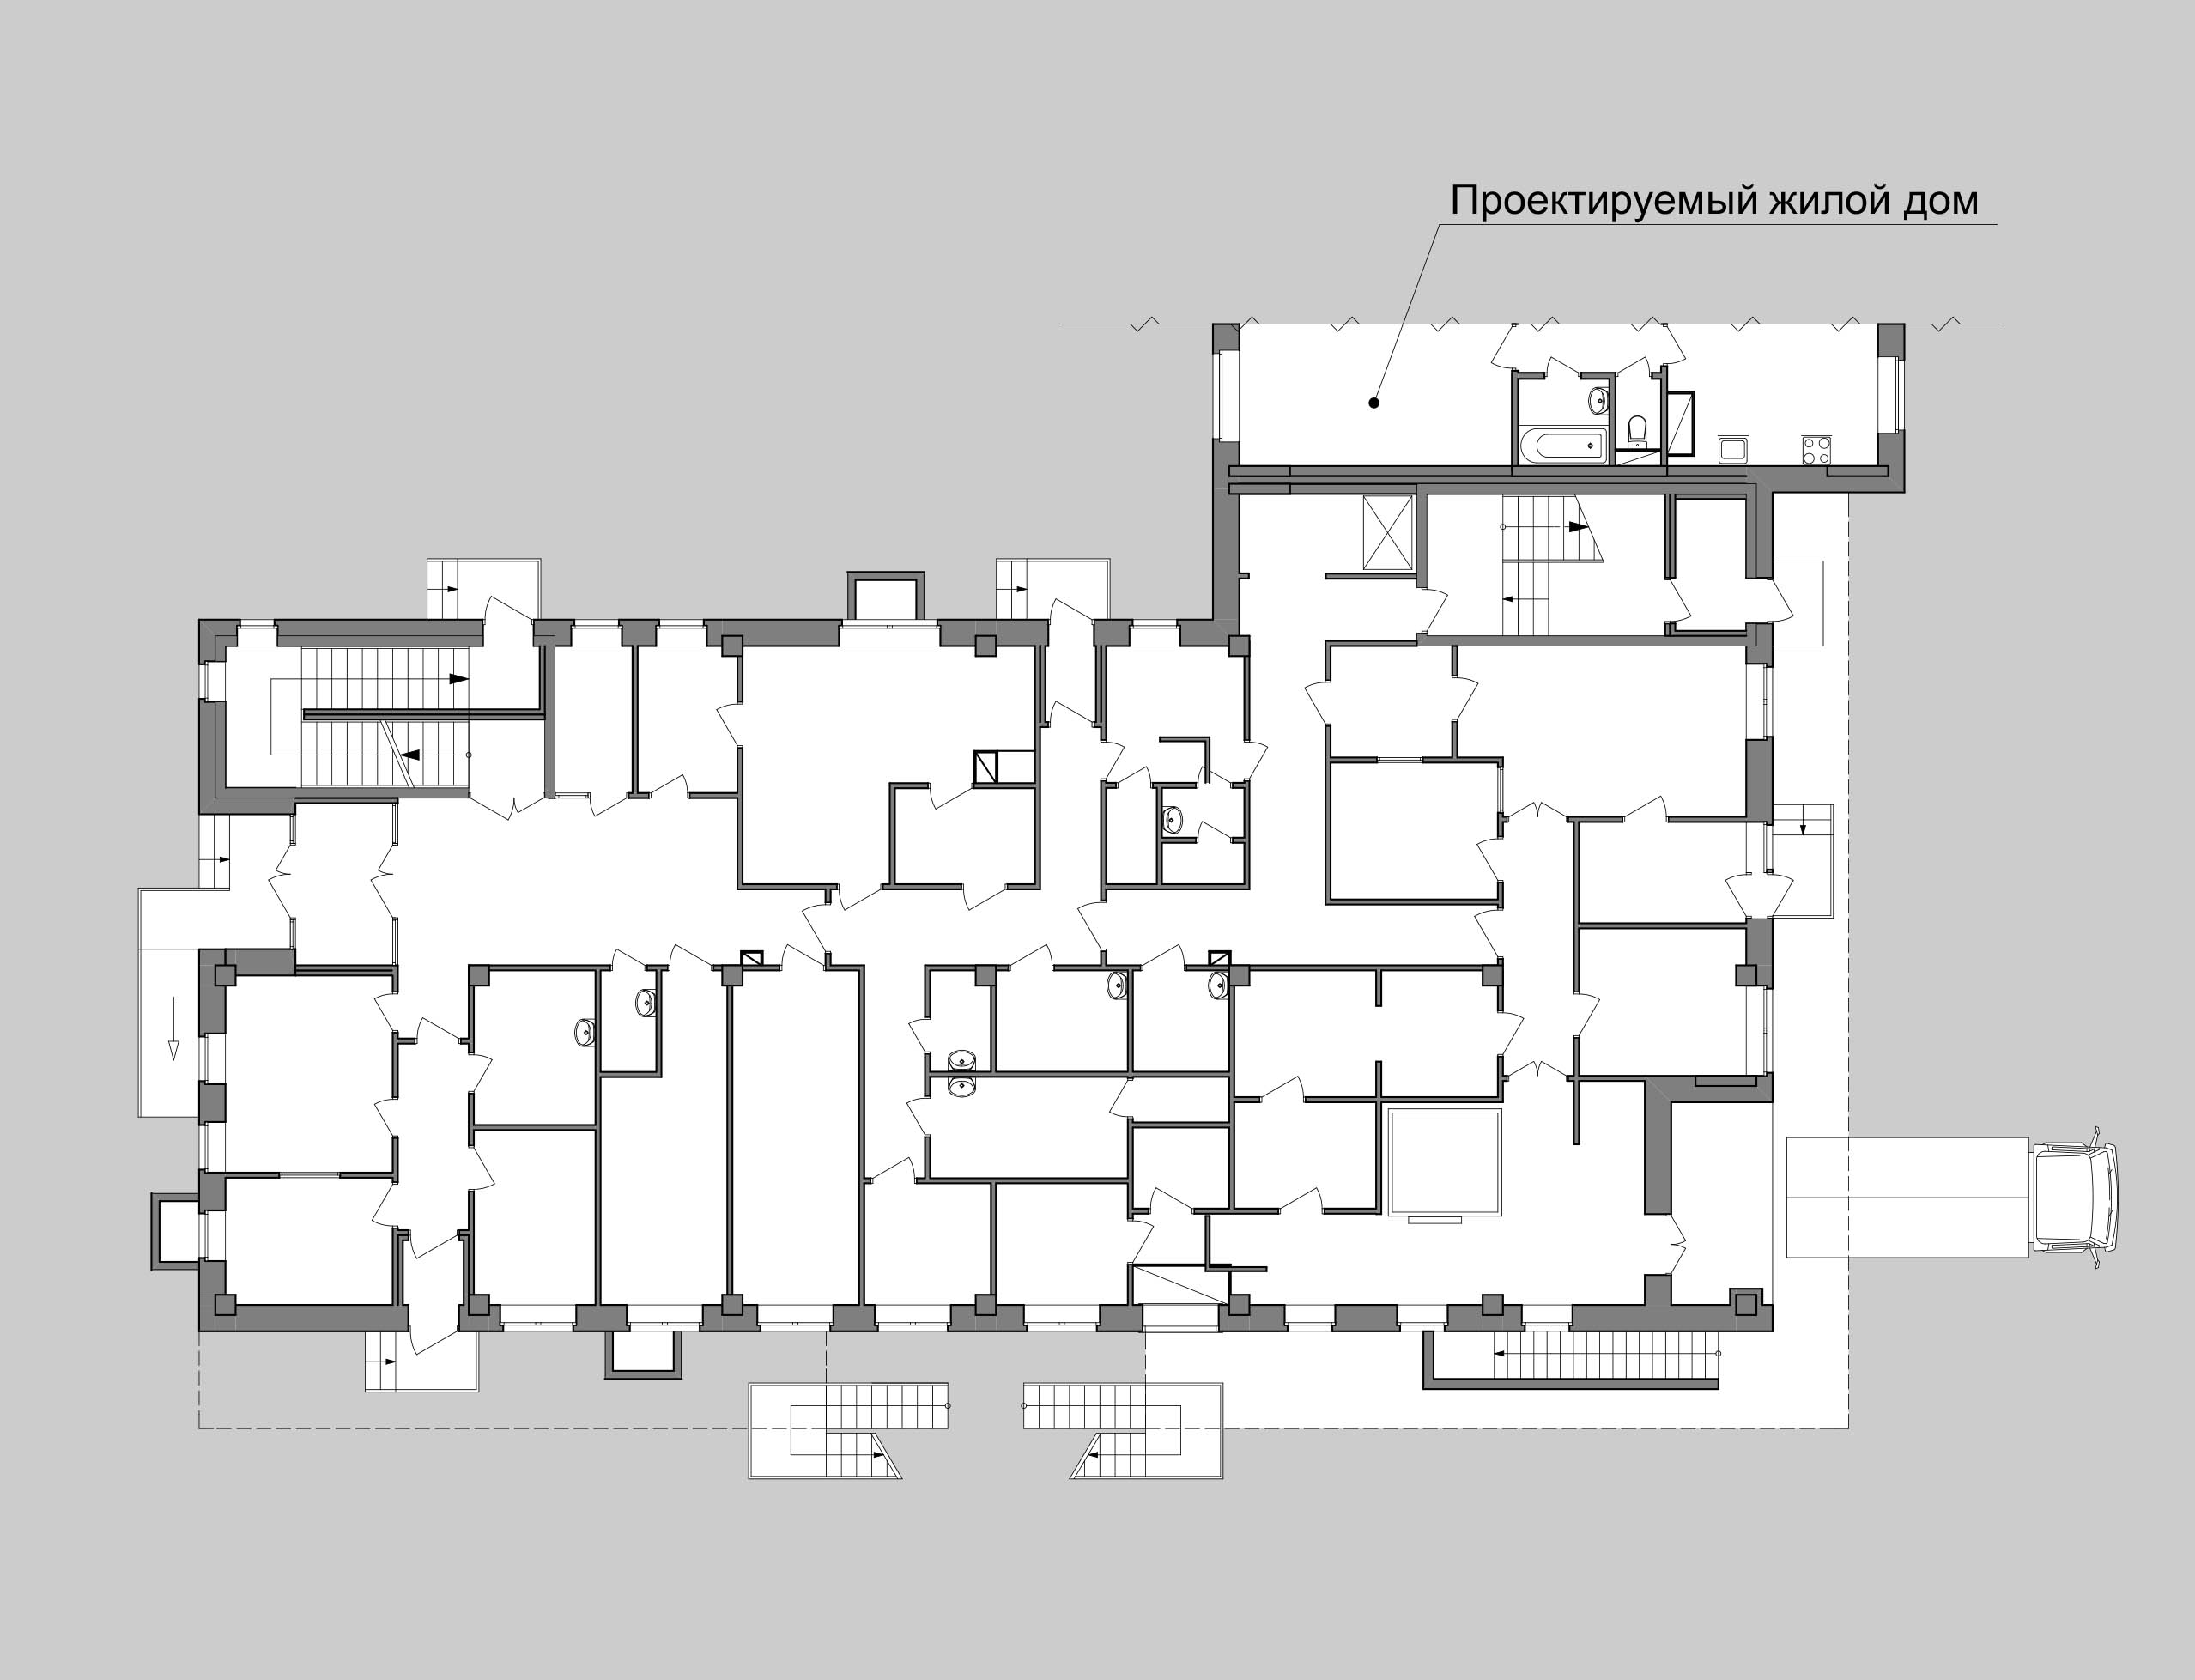 детский сад план 1 этажа